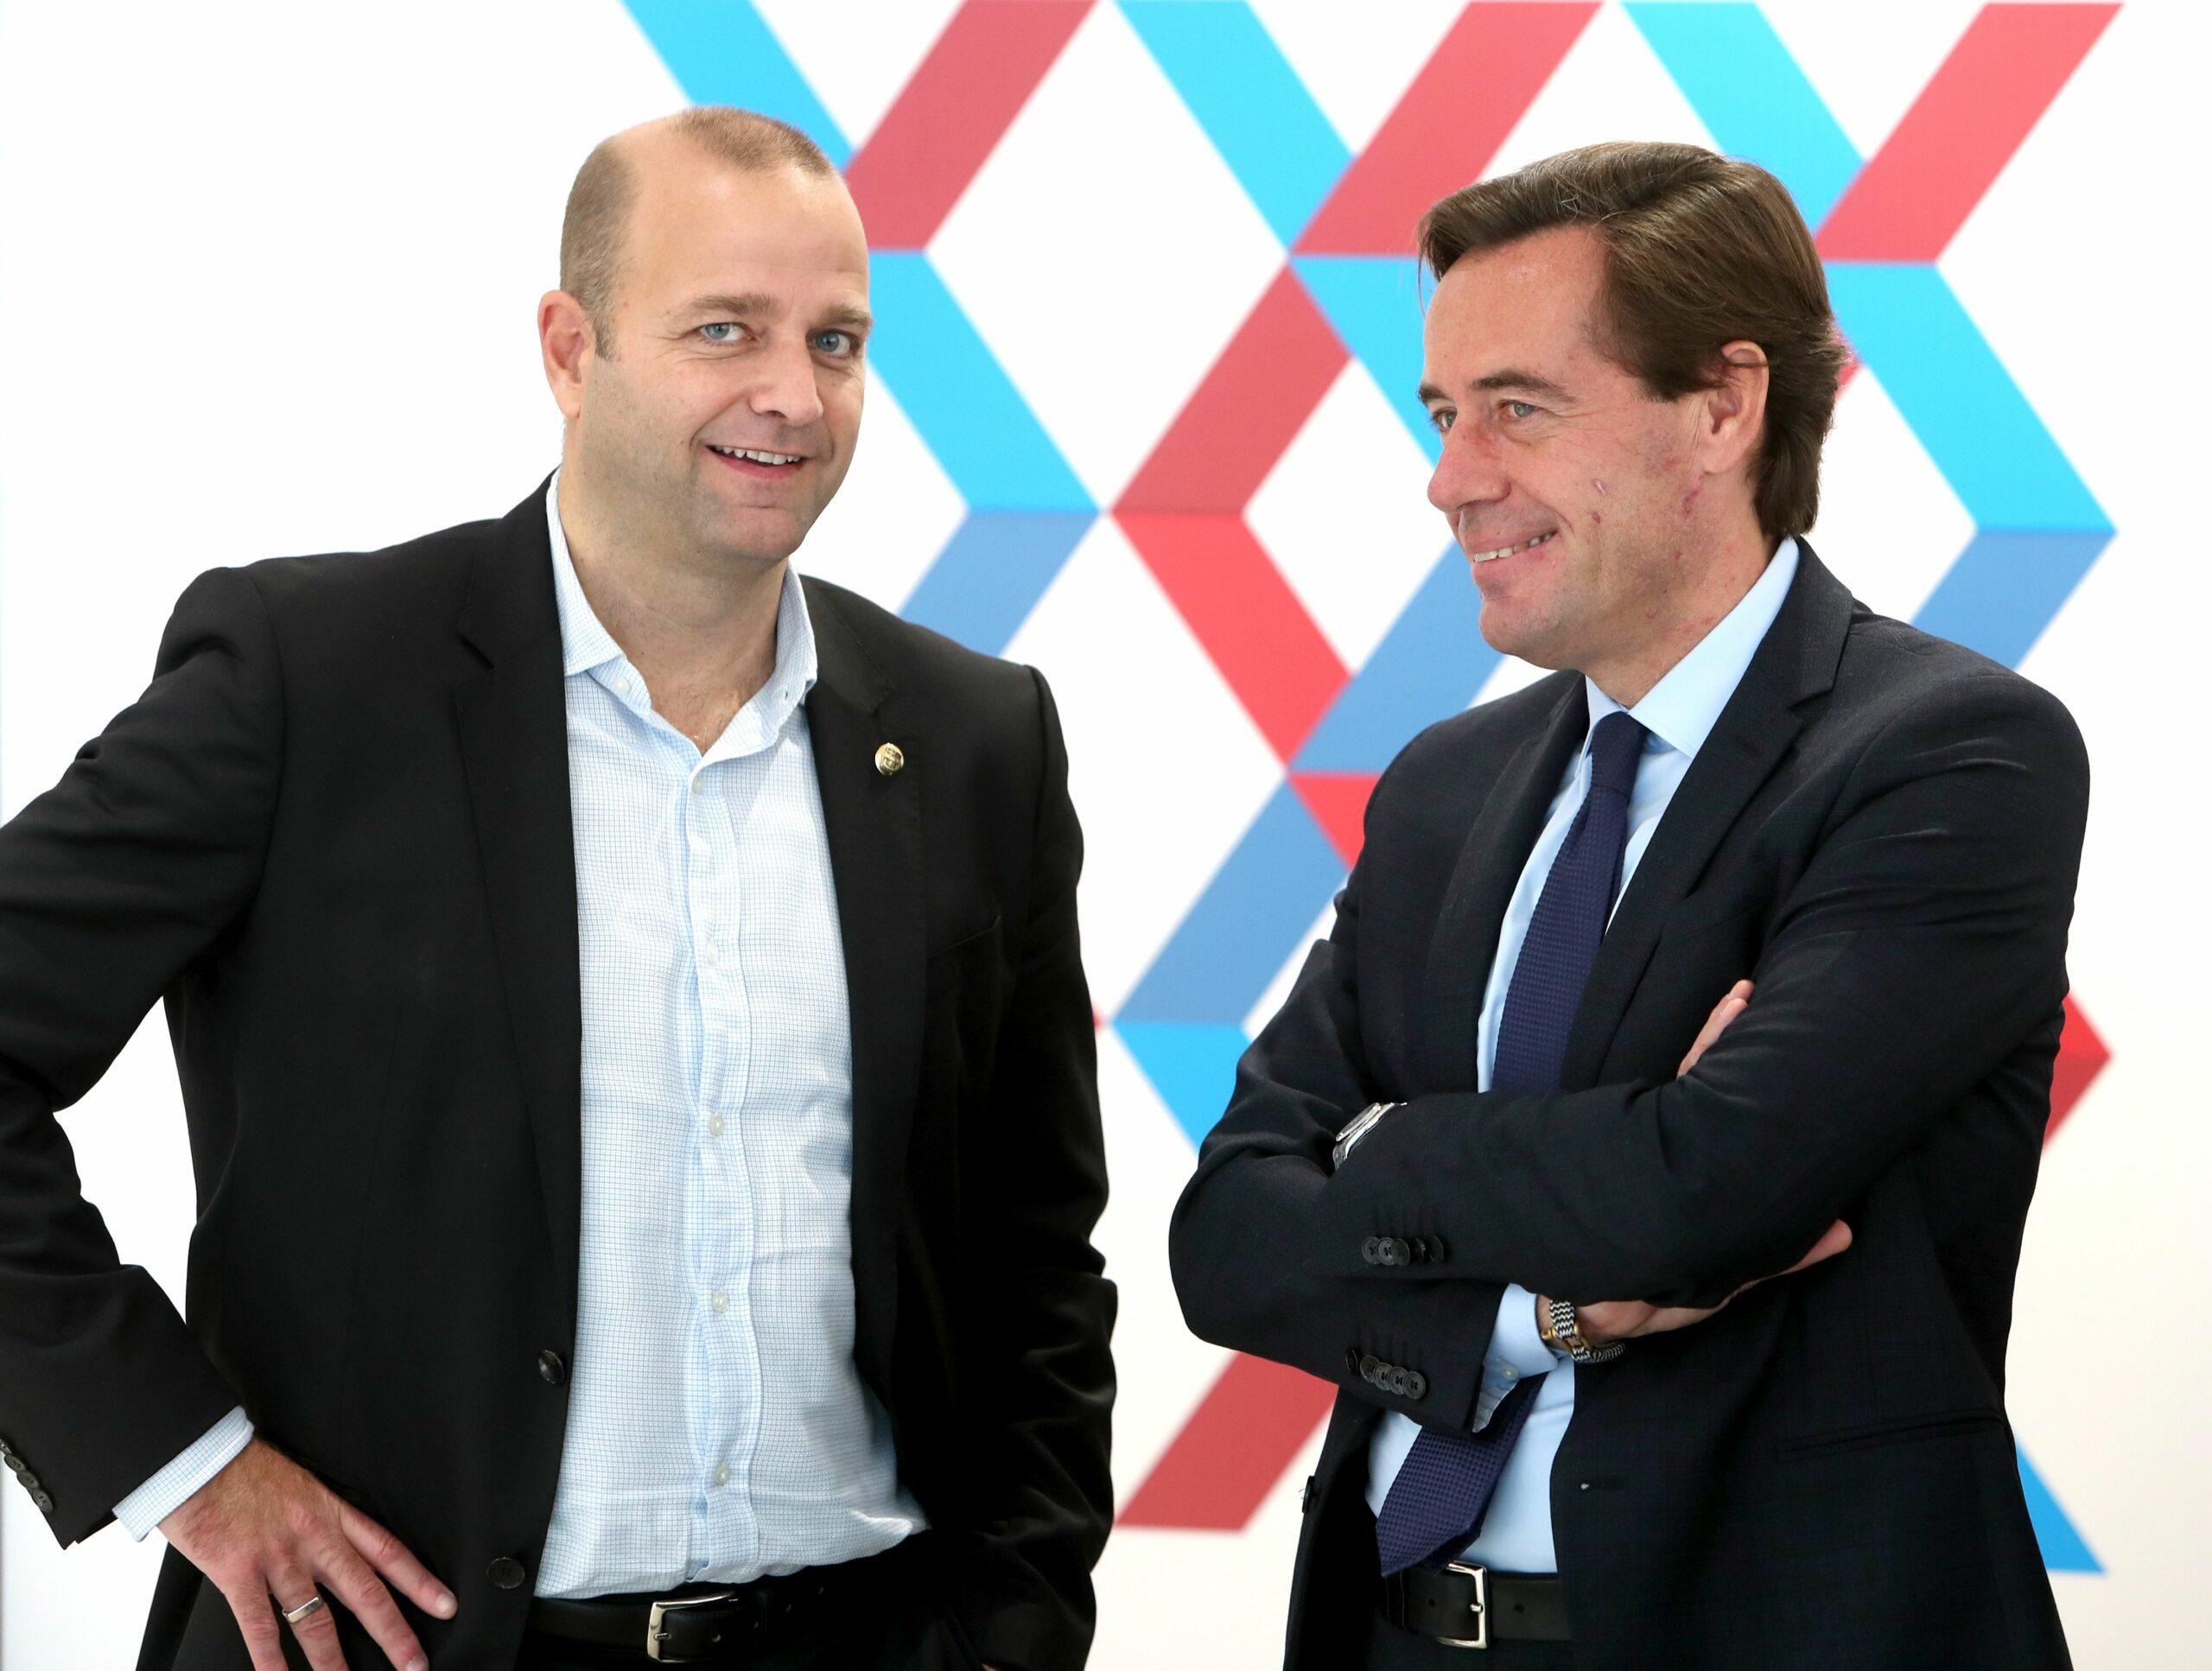 Xavi Vilajoana incorpora al seu equip Francesc Rebled, expresident del Girona | Marc Casanovas